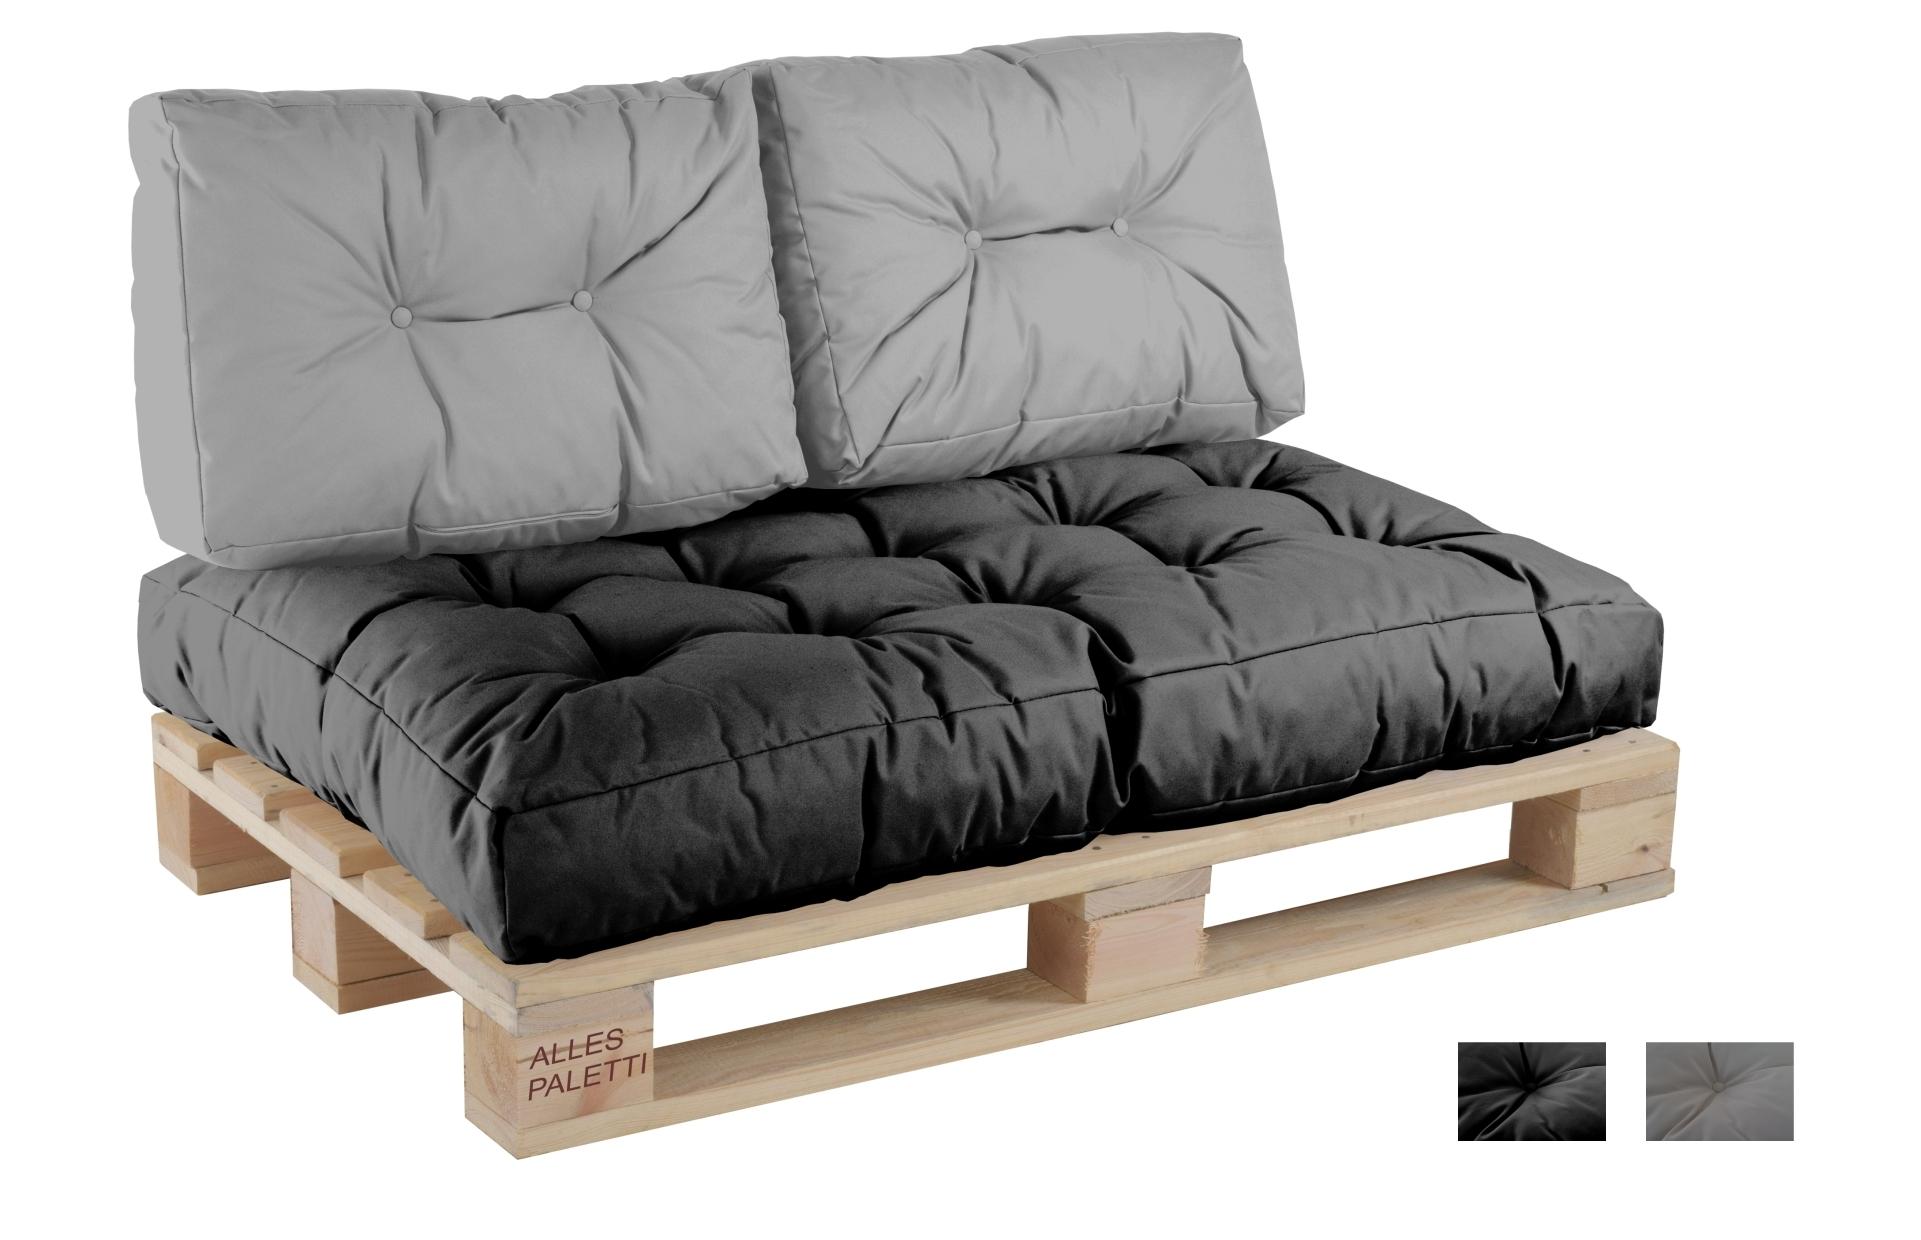 Matratzen sofa  Euro-Palettenkissen Indoor/Outdoor Vita-line